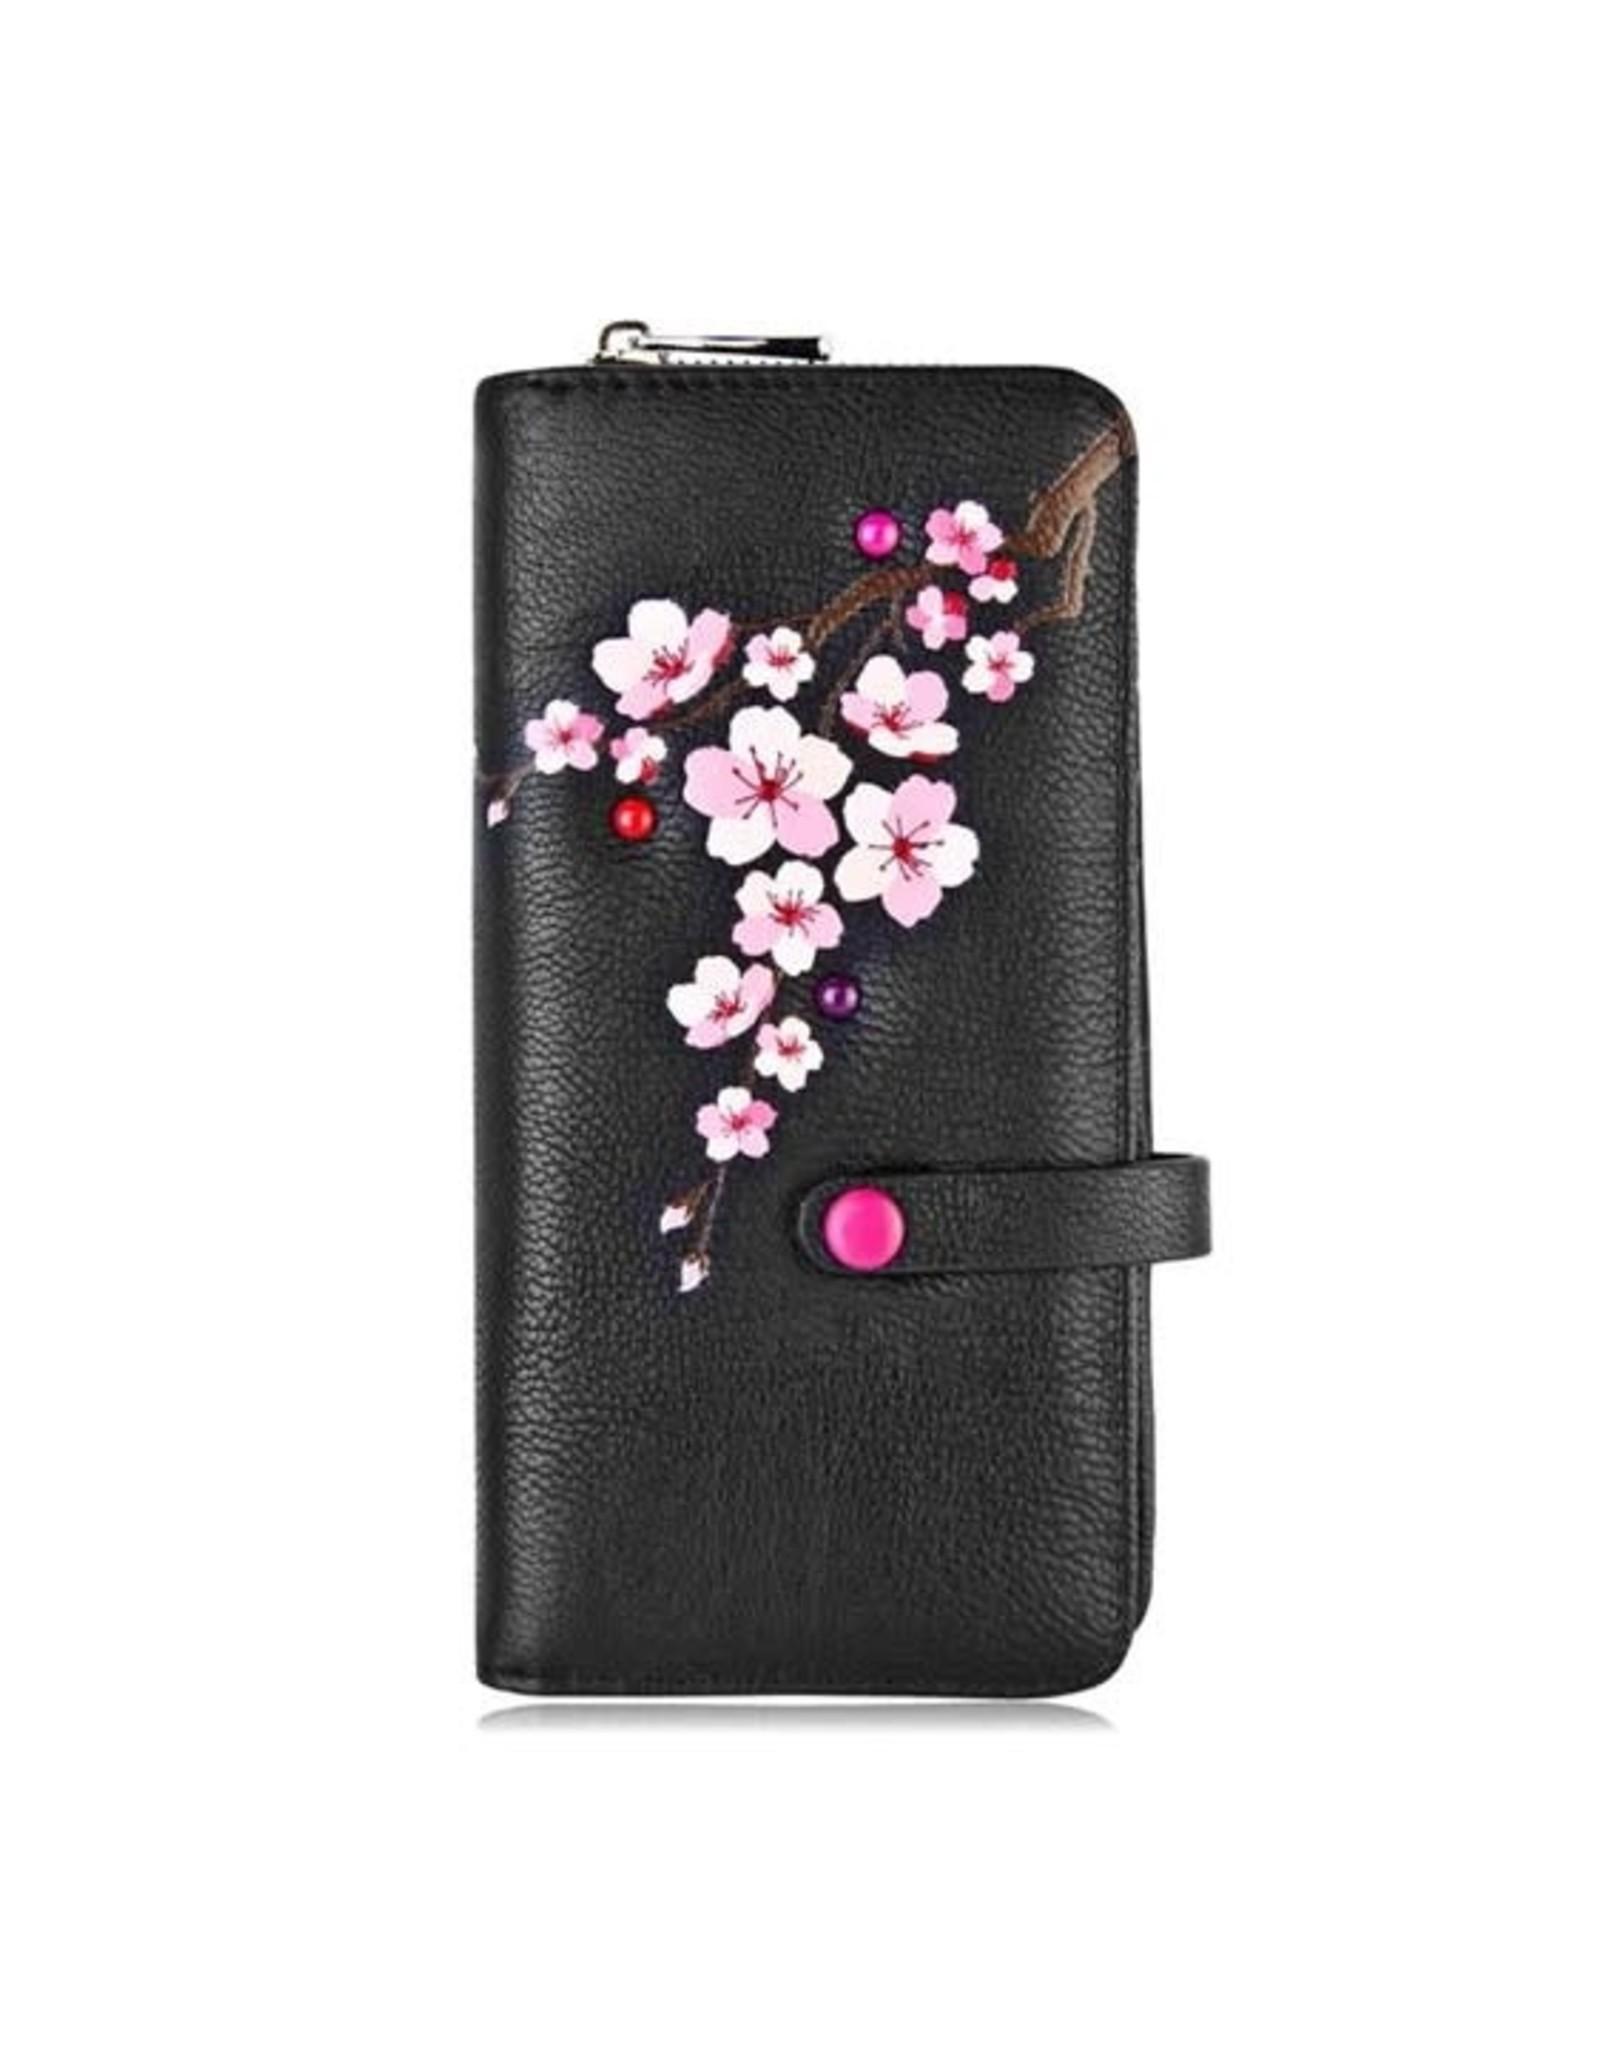 ESPE Portefeuille clutch Blossom - Noir